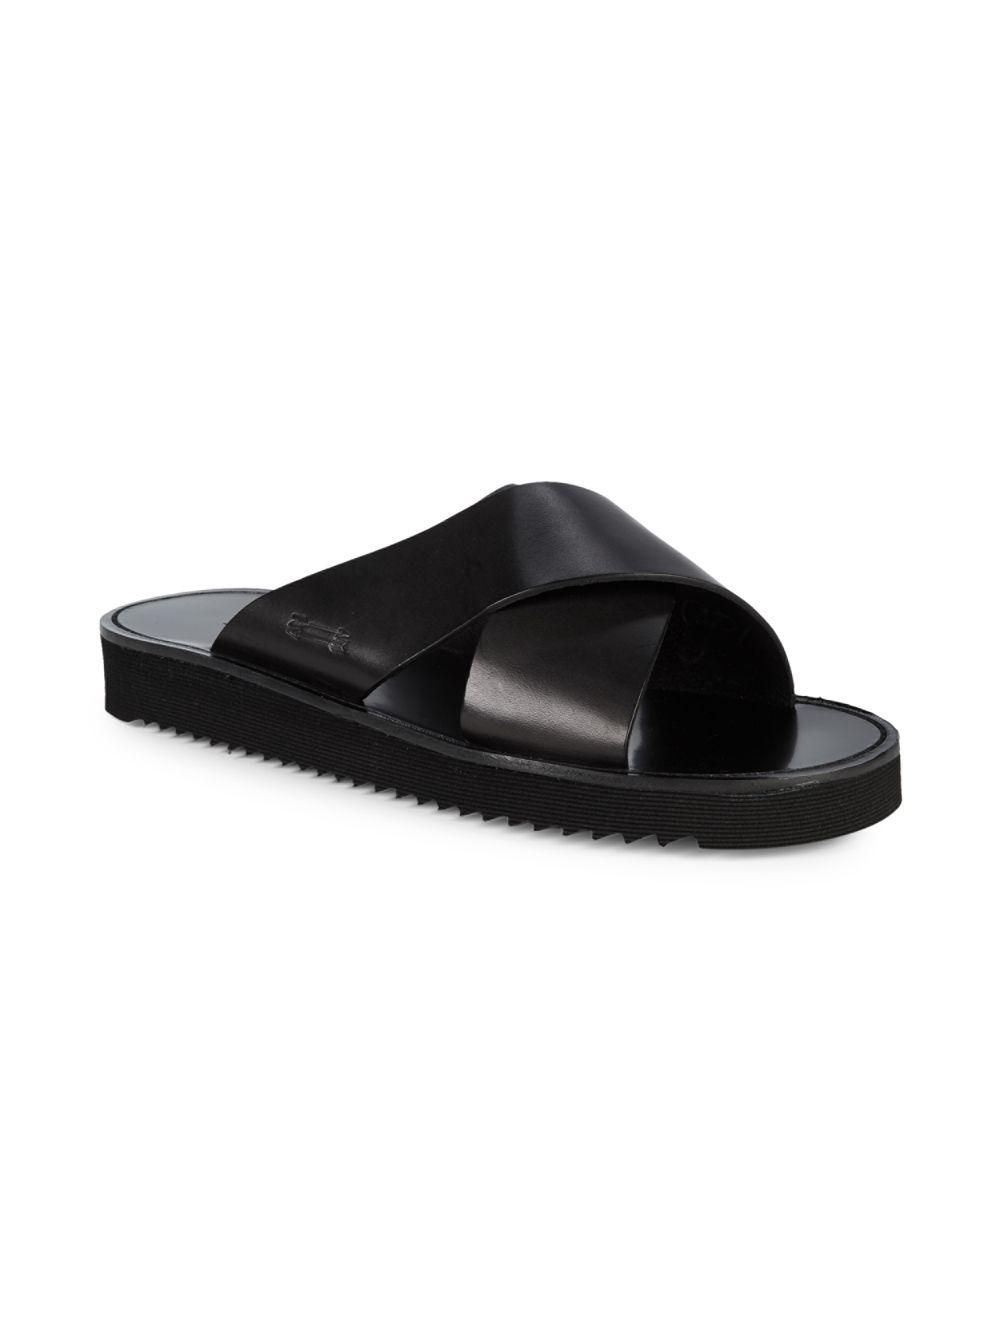 77422c3bb403 Lyst - Uri Minkoff Otto Leather Slides in Black for Men